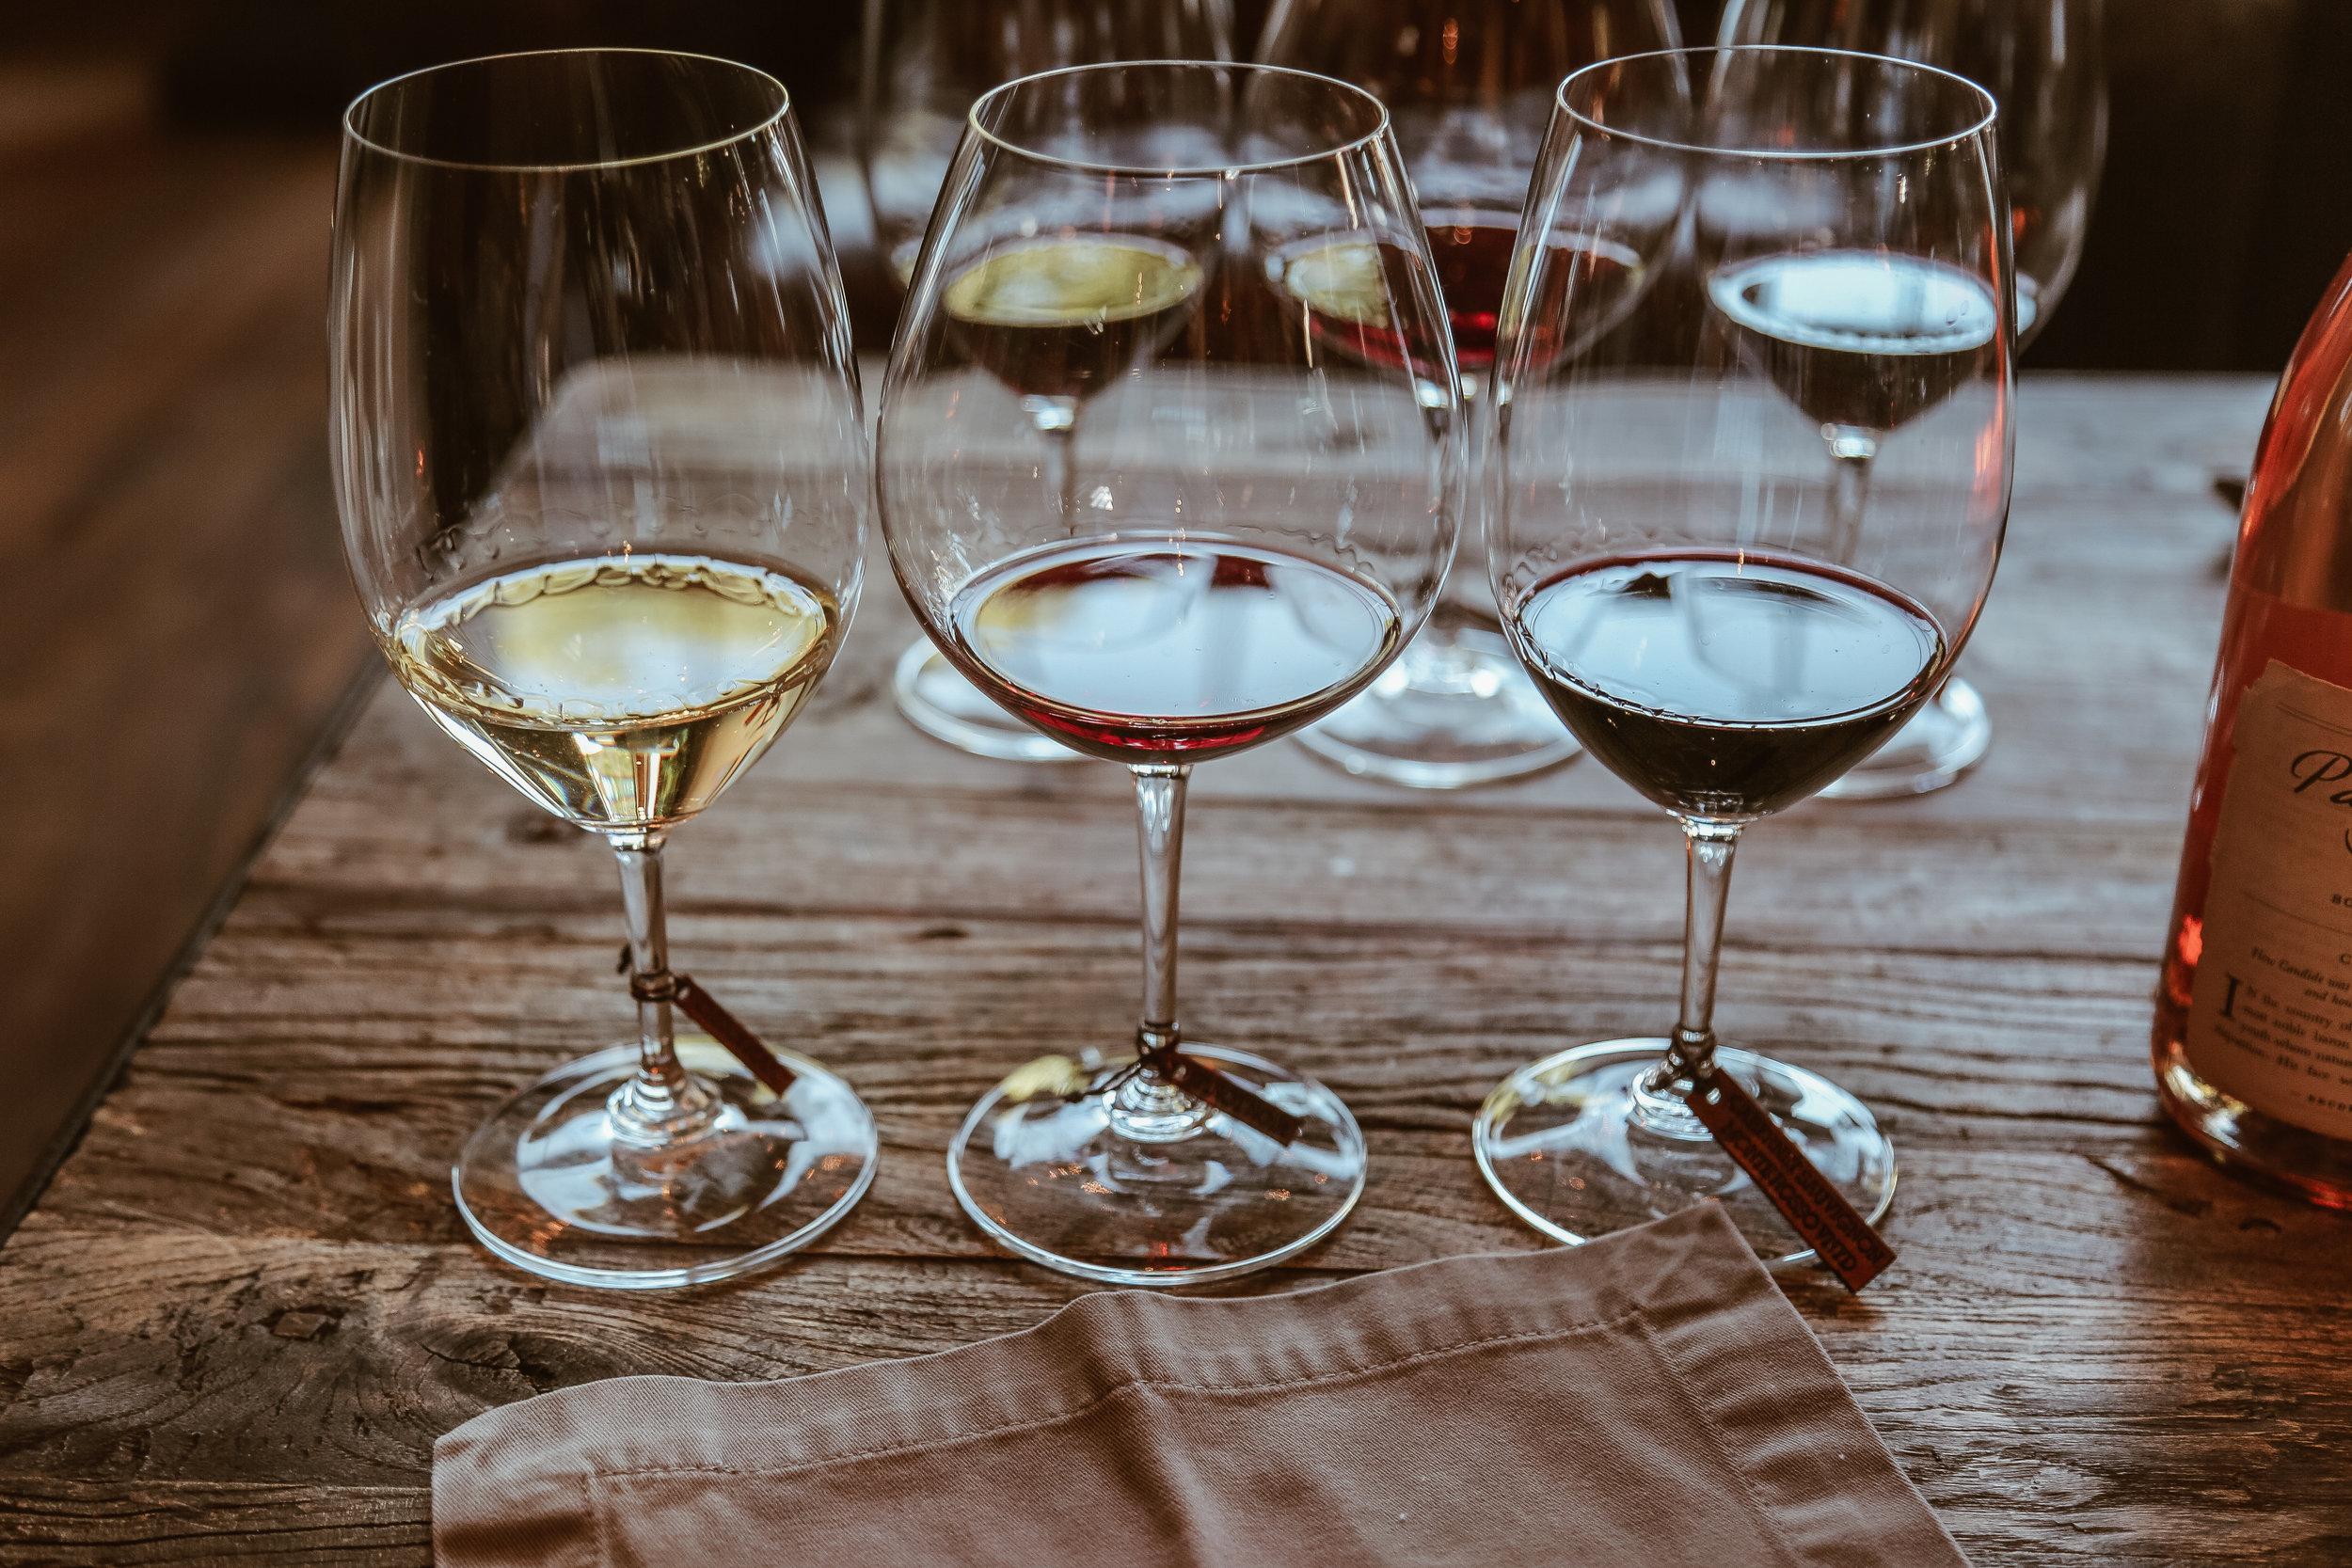 Wine Pairings for the Seasons in Sonoma Tasting - 2015 Chenin Blanc| 2014 Pinot Noir | 2013 Cabernet Sauvignon, Monte Rosso Vineyard